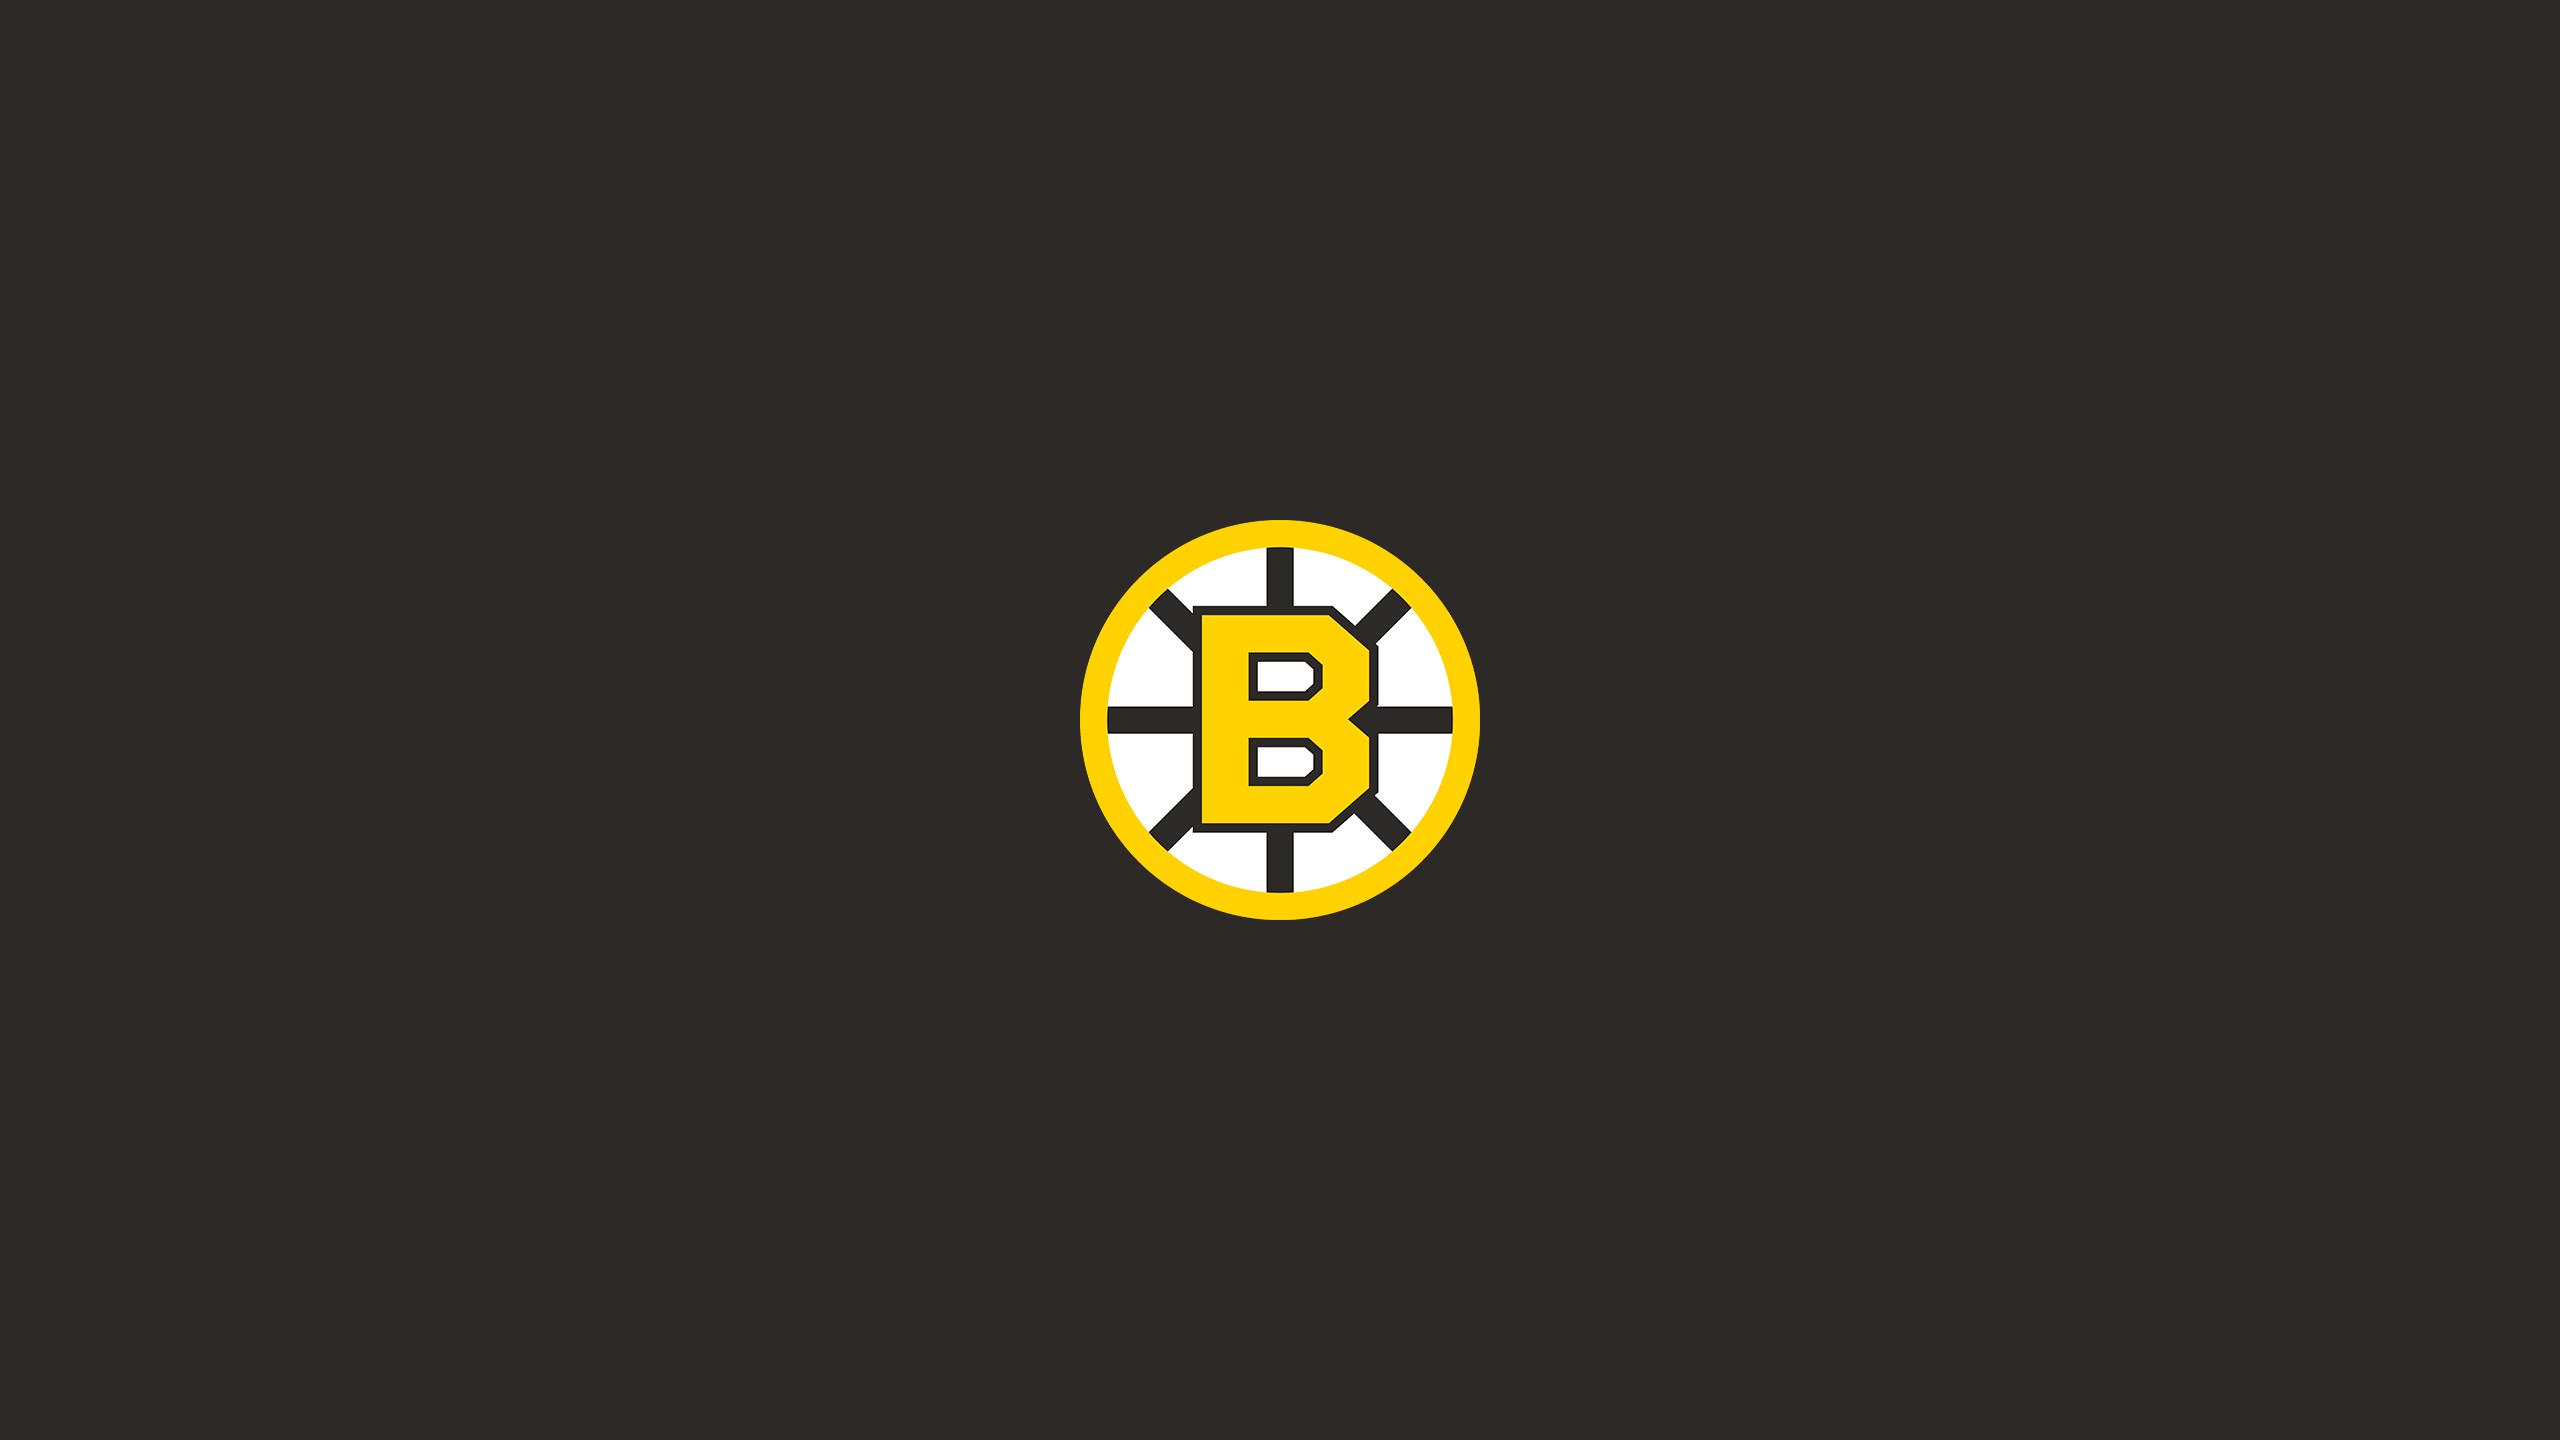 Boston Bruins (Old School)